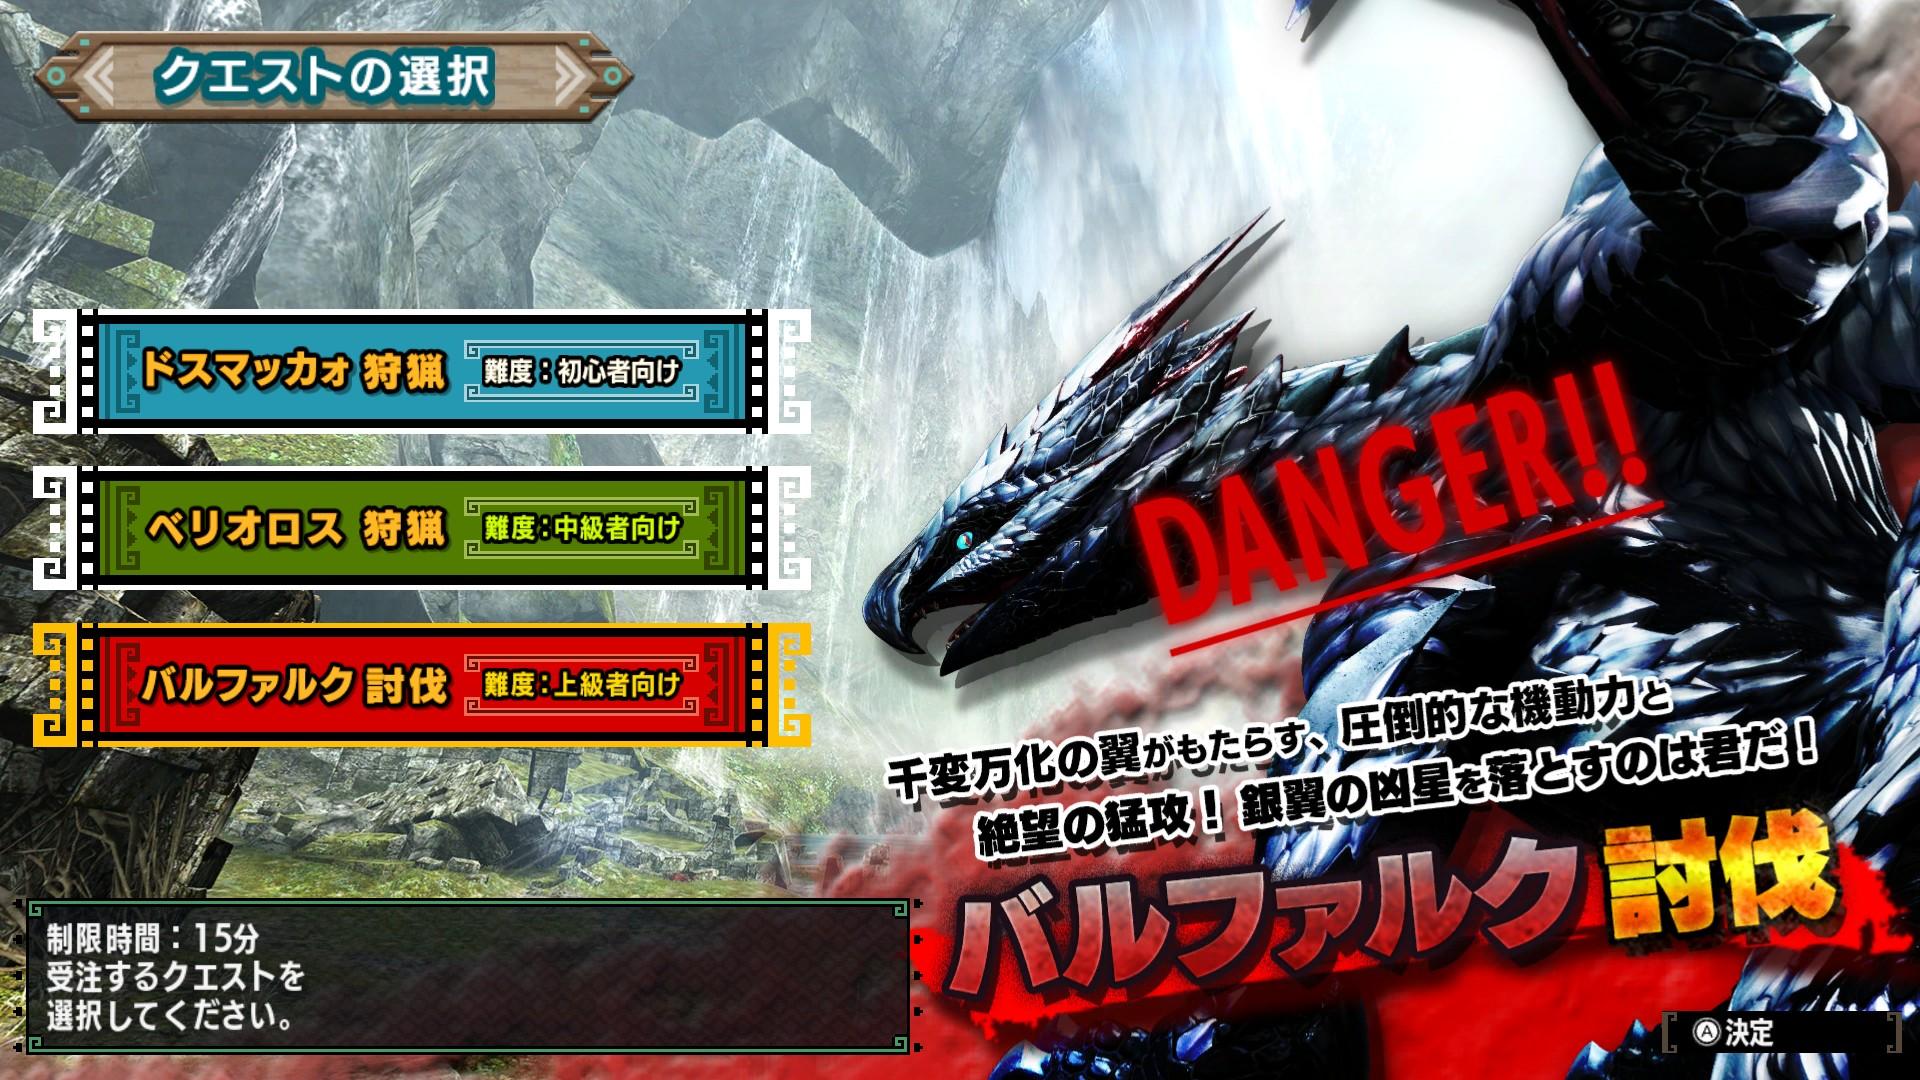 Monster-Hunter-XX-Nintendo-Switch-Ver_2017_06-26-17_002